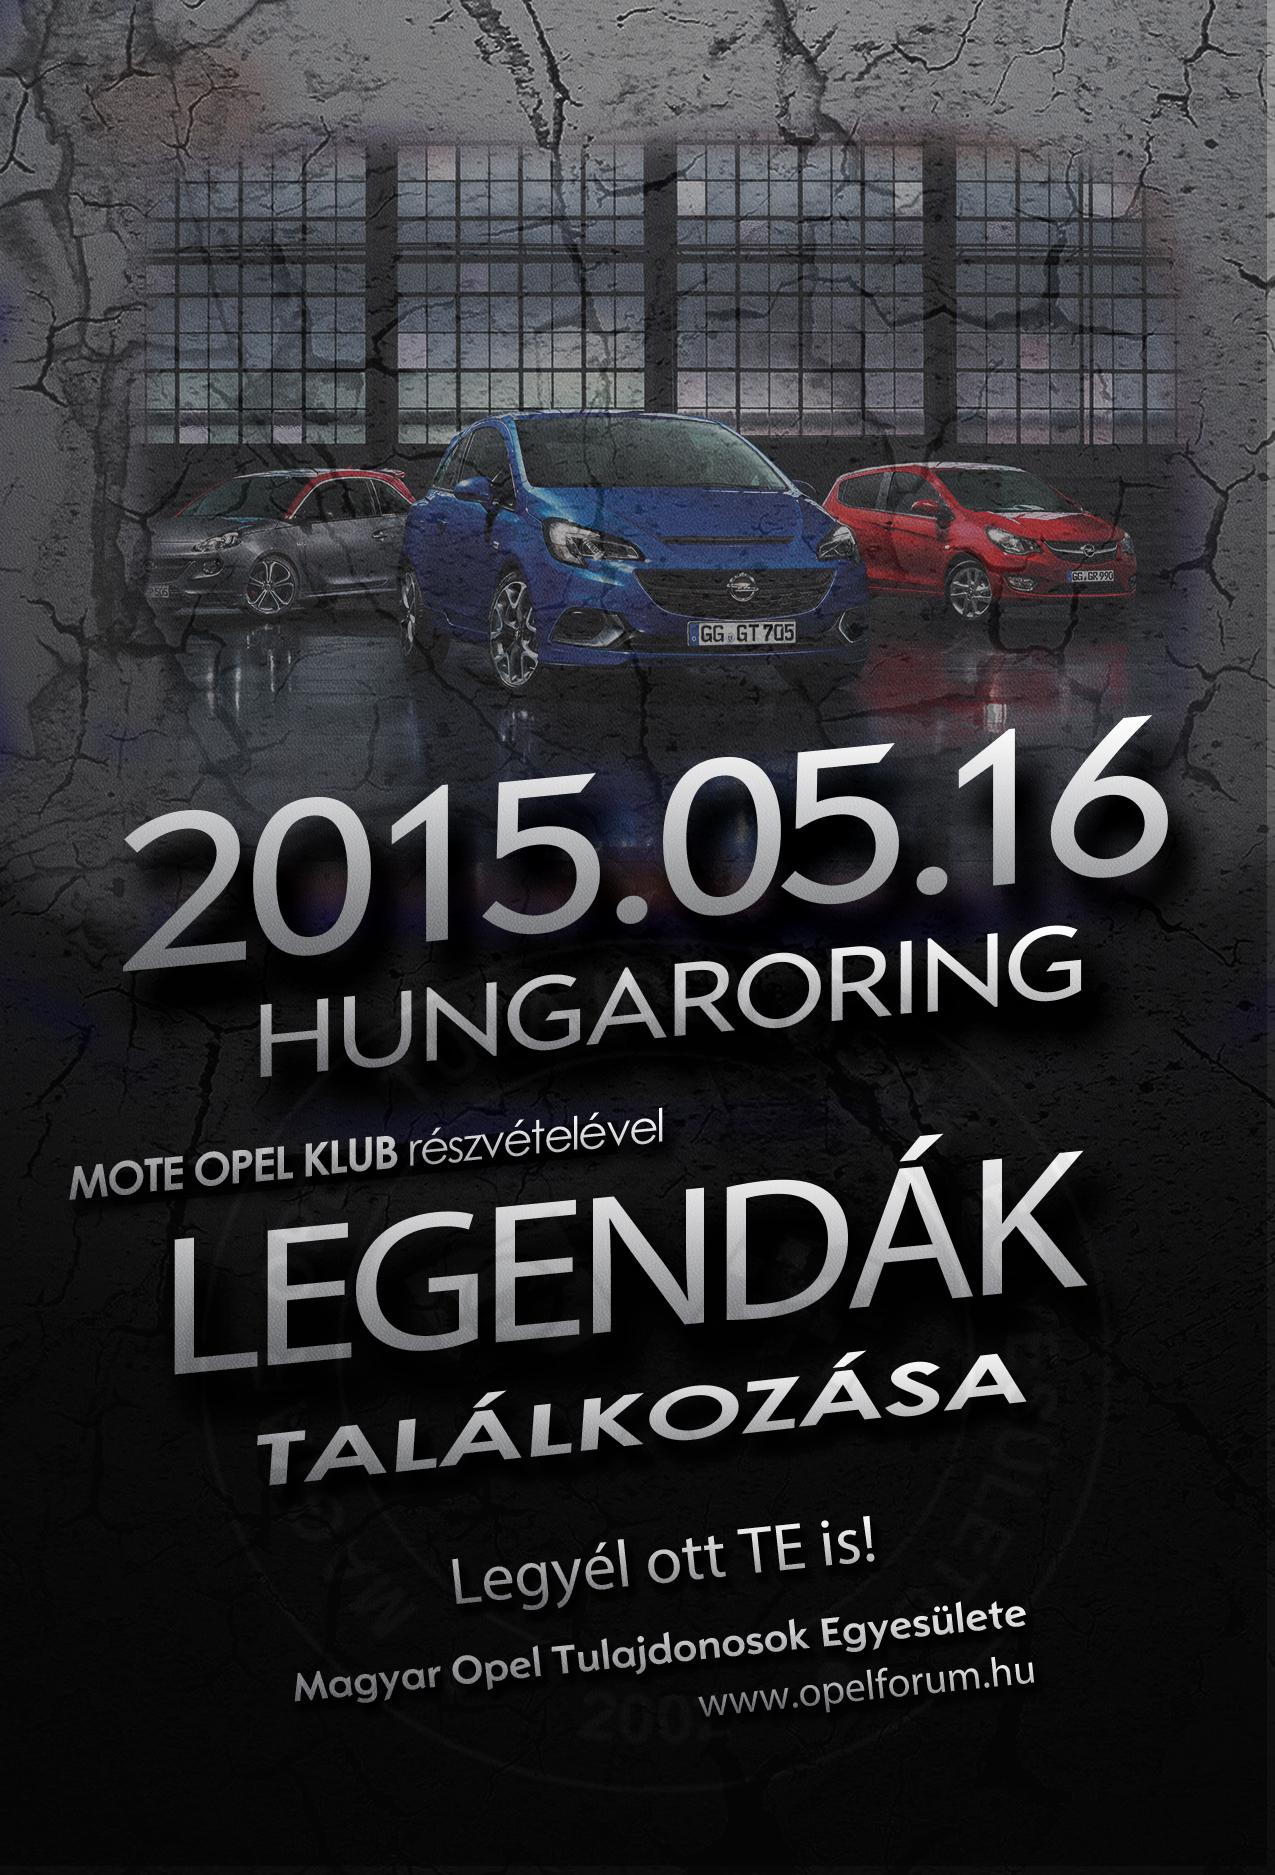 Legendak_talalkozasa_2015.jpg